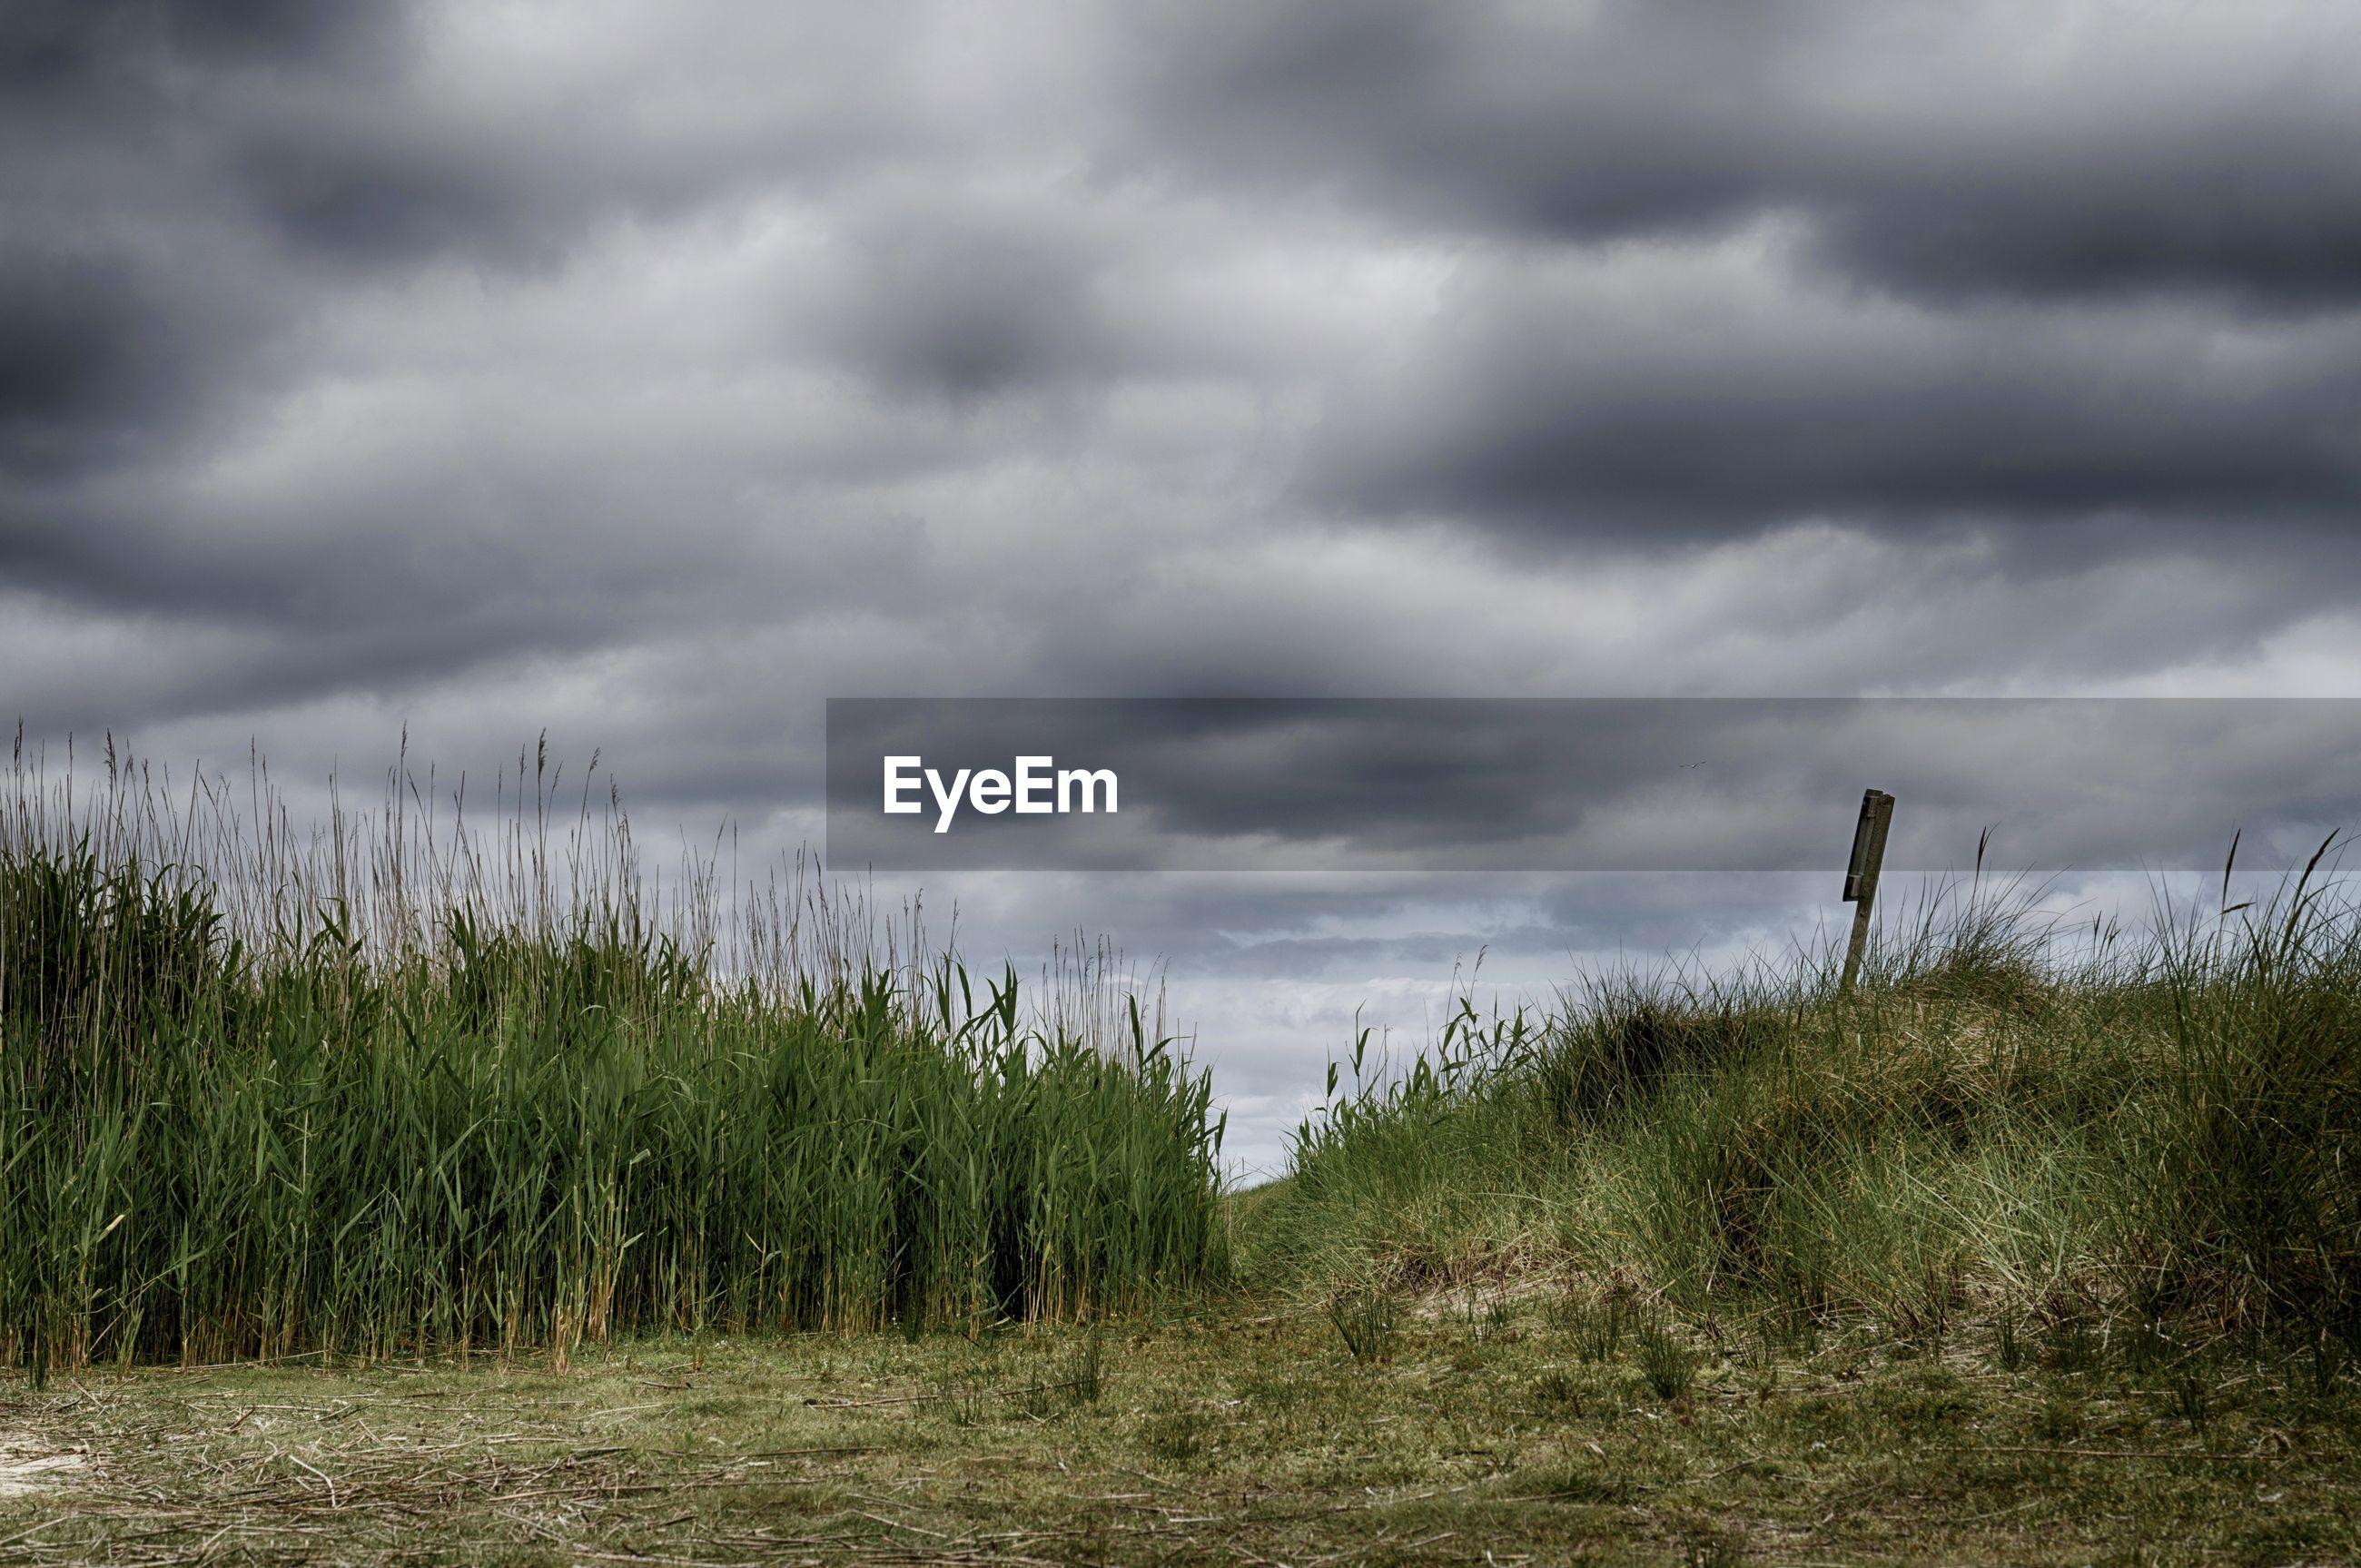 GRASSY FIELD AGAINST CLOUDY SKY